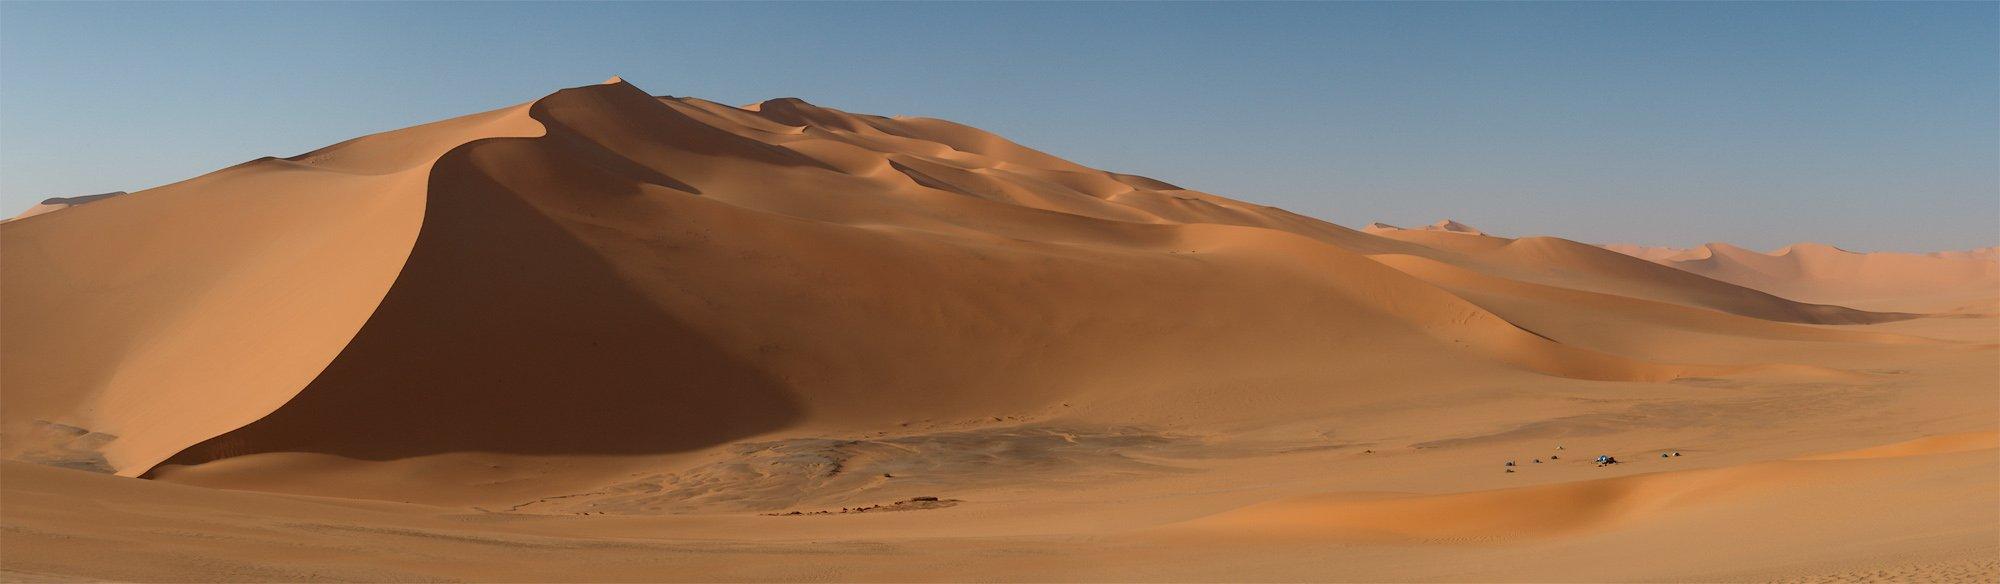 сахара, дюна, песок, Виктор Чистов